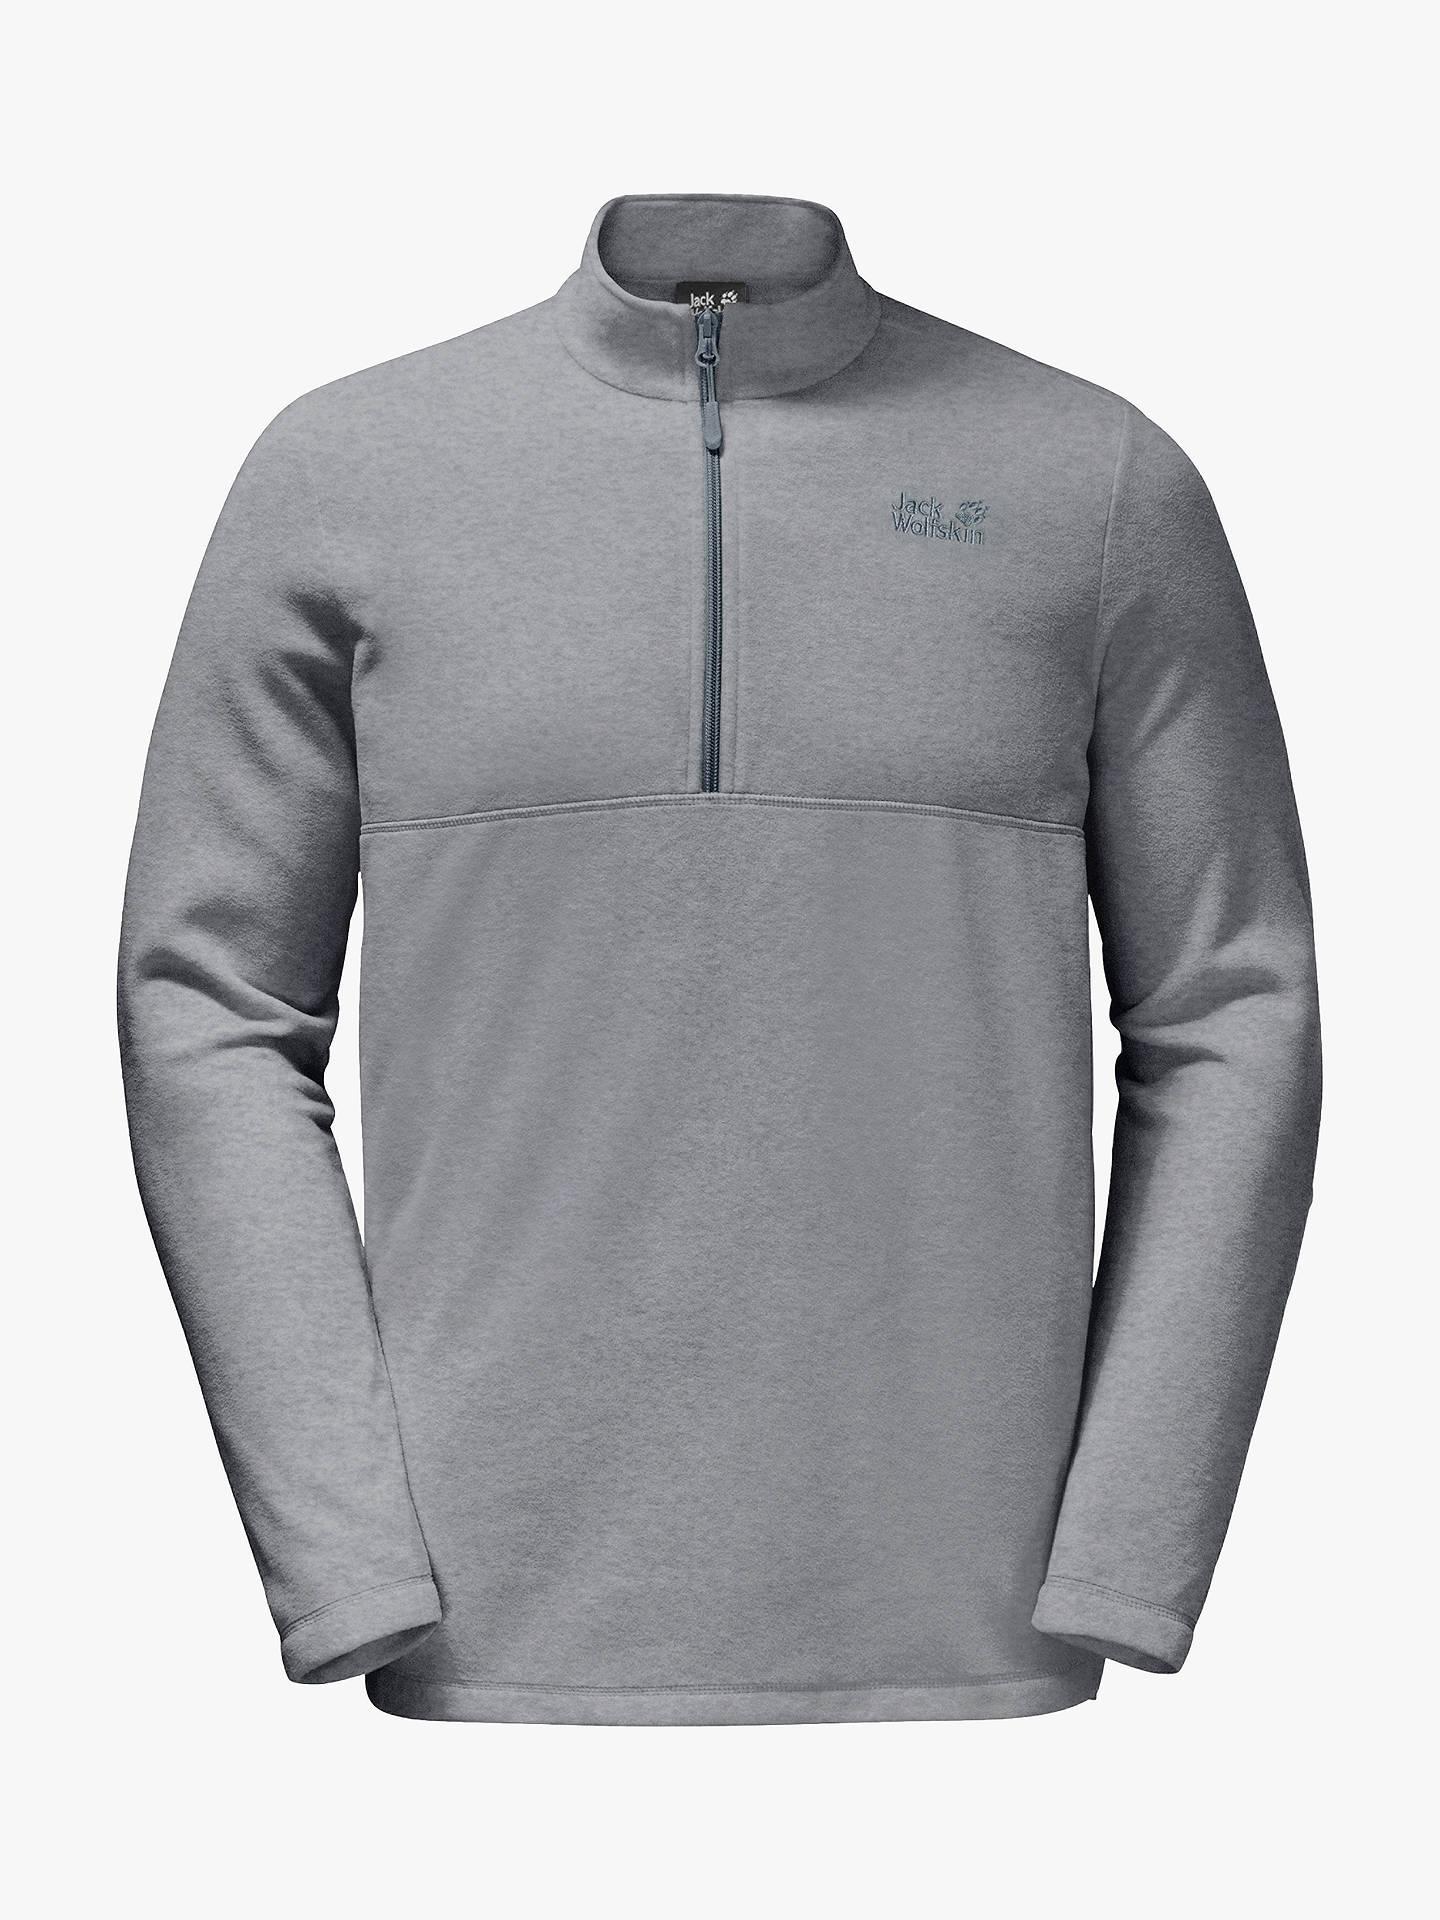 promo code 437c7 c04bf Jack Wolfskin Gecko Men's Fleece, Slate Grey